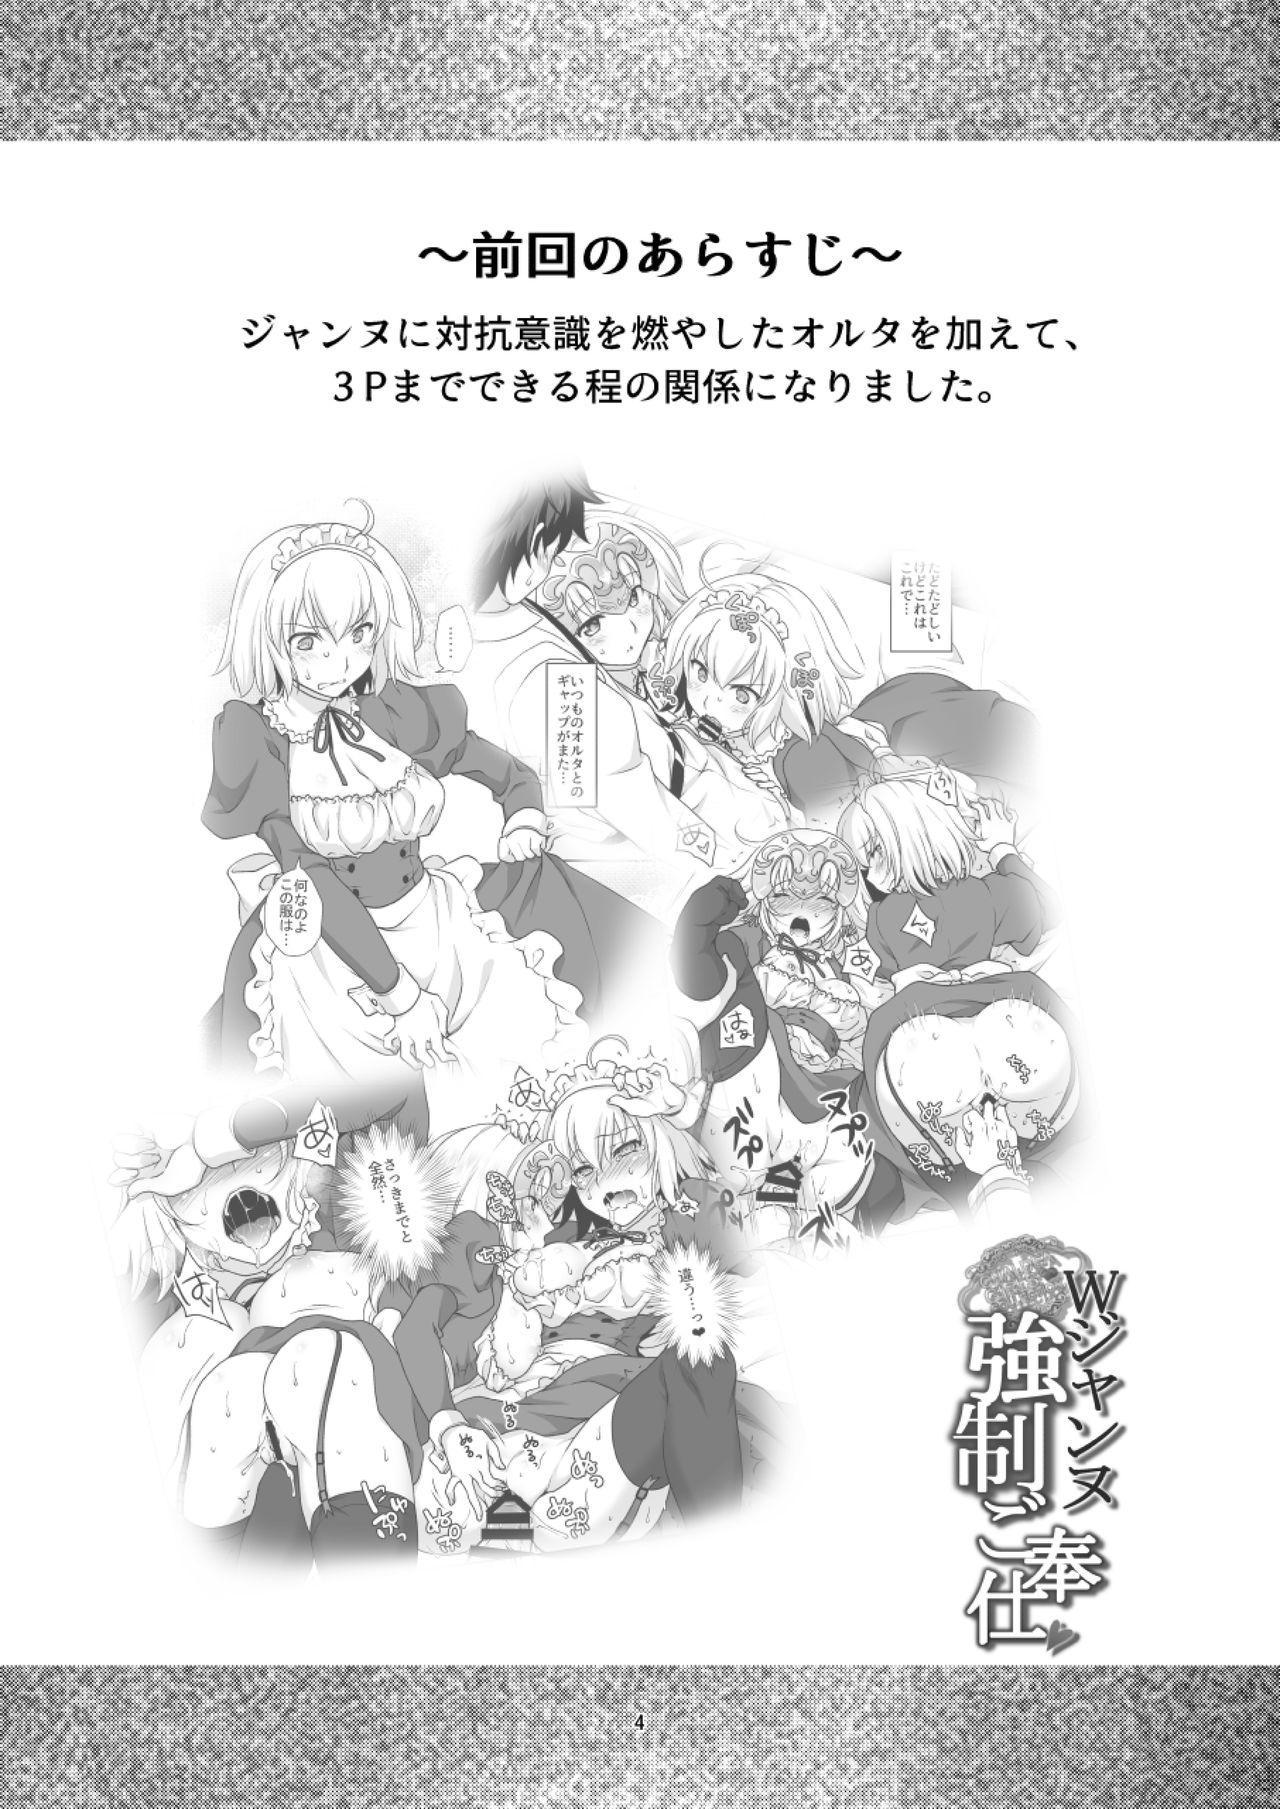 Chaldea Girls Collection W Jeanne Kyousei Gohoushi 3